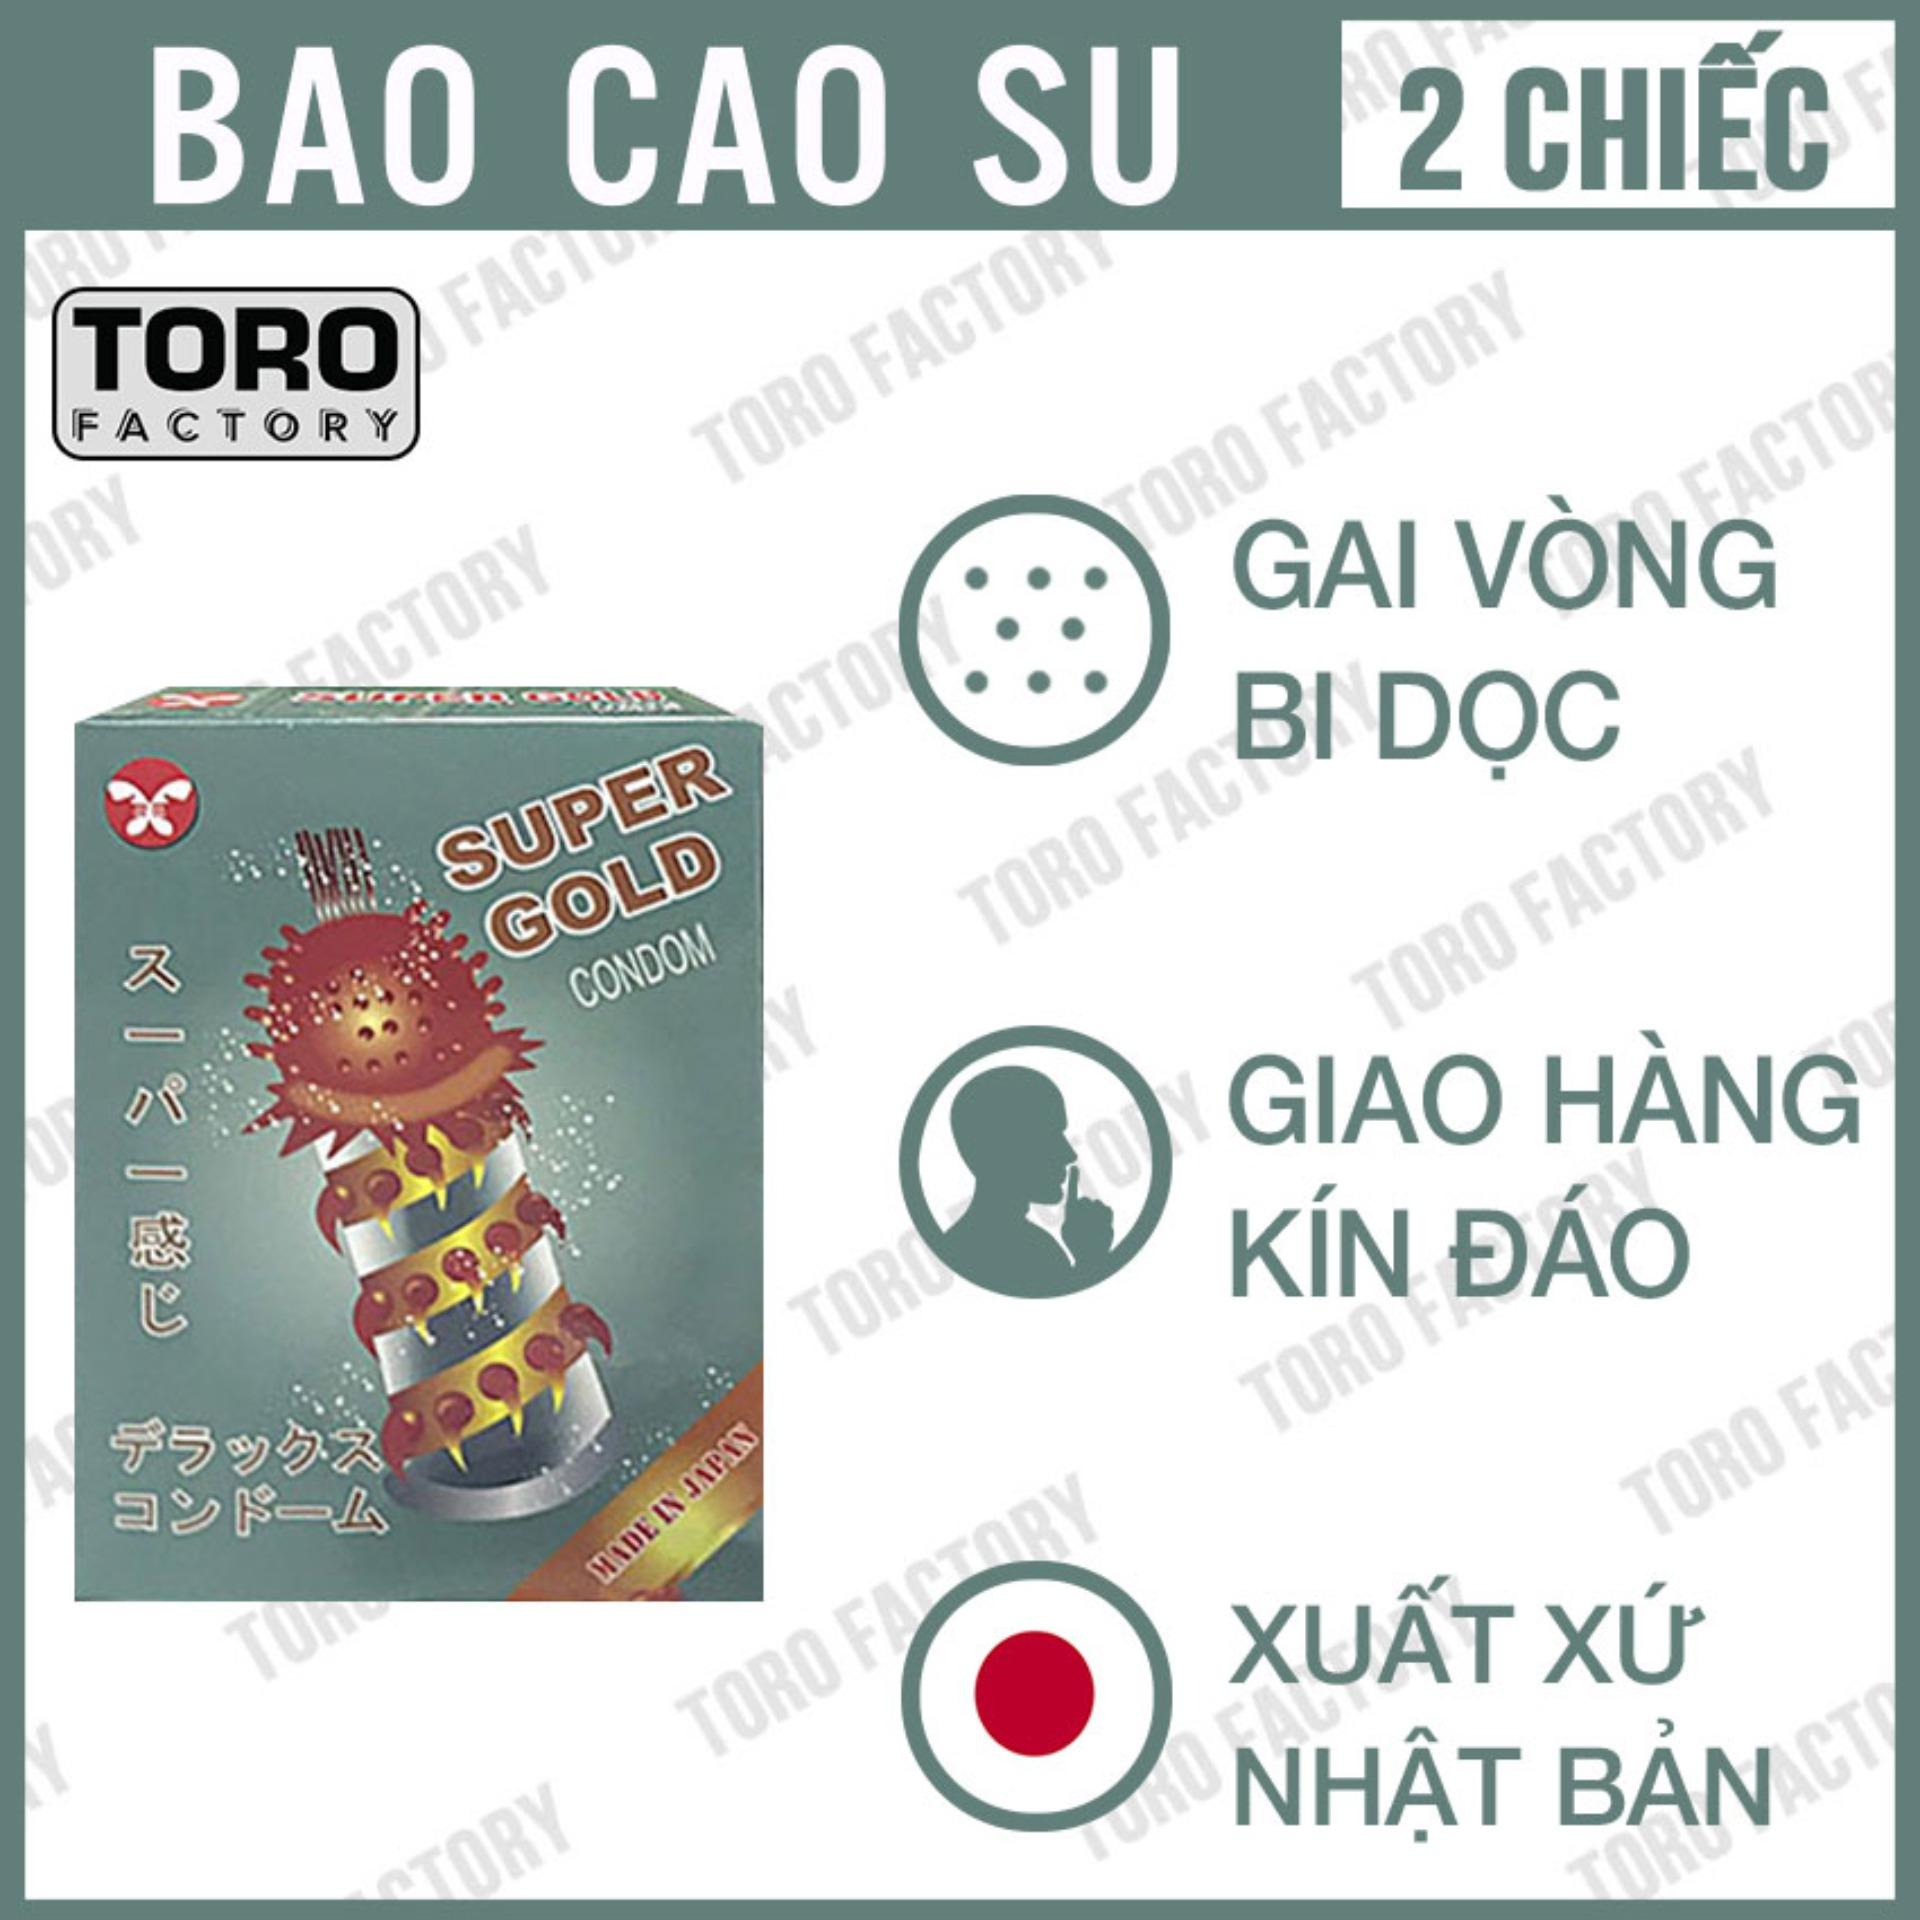 Bao cao su Super Gold Gân, Gai siêu lớn - Toro nhập khẩu